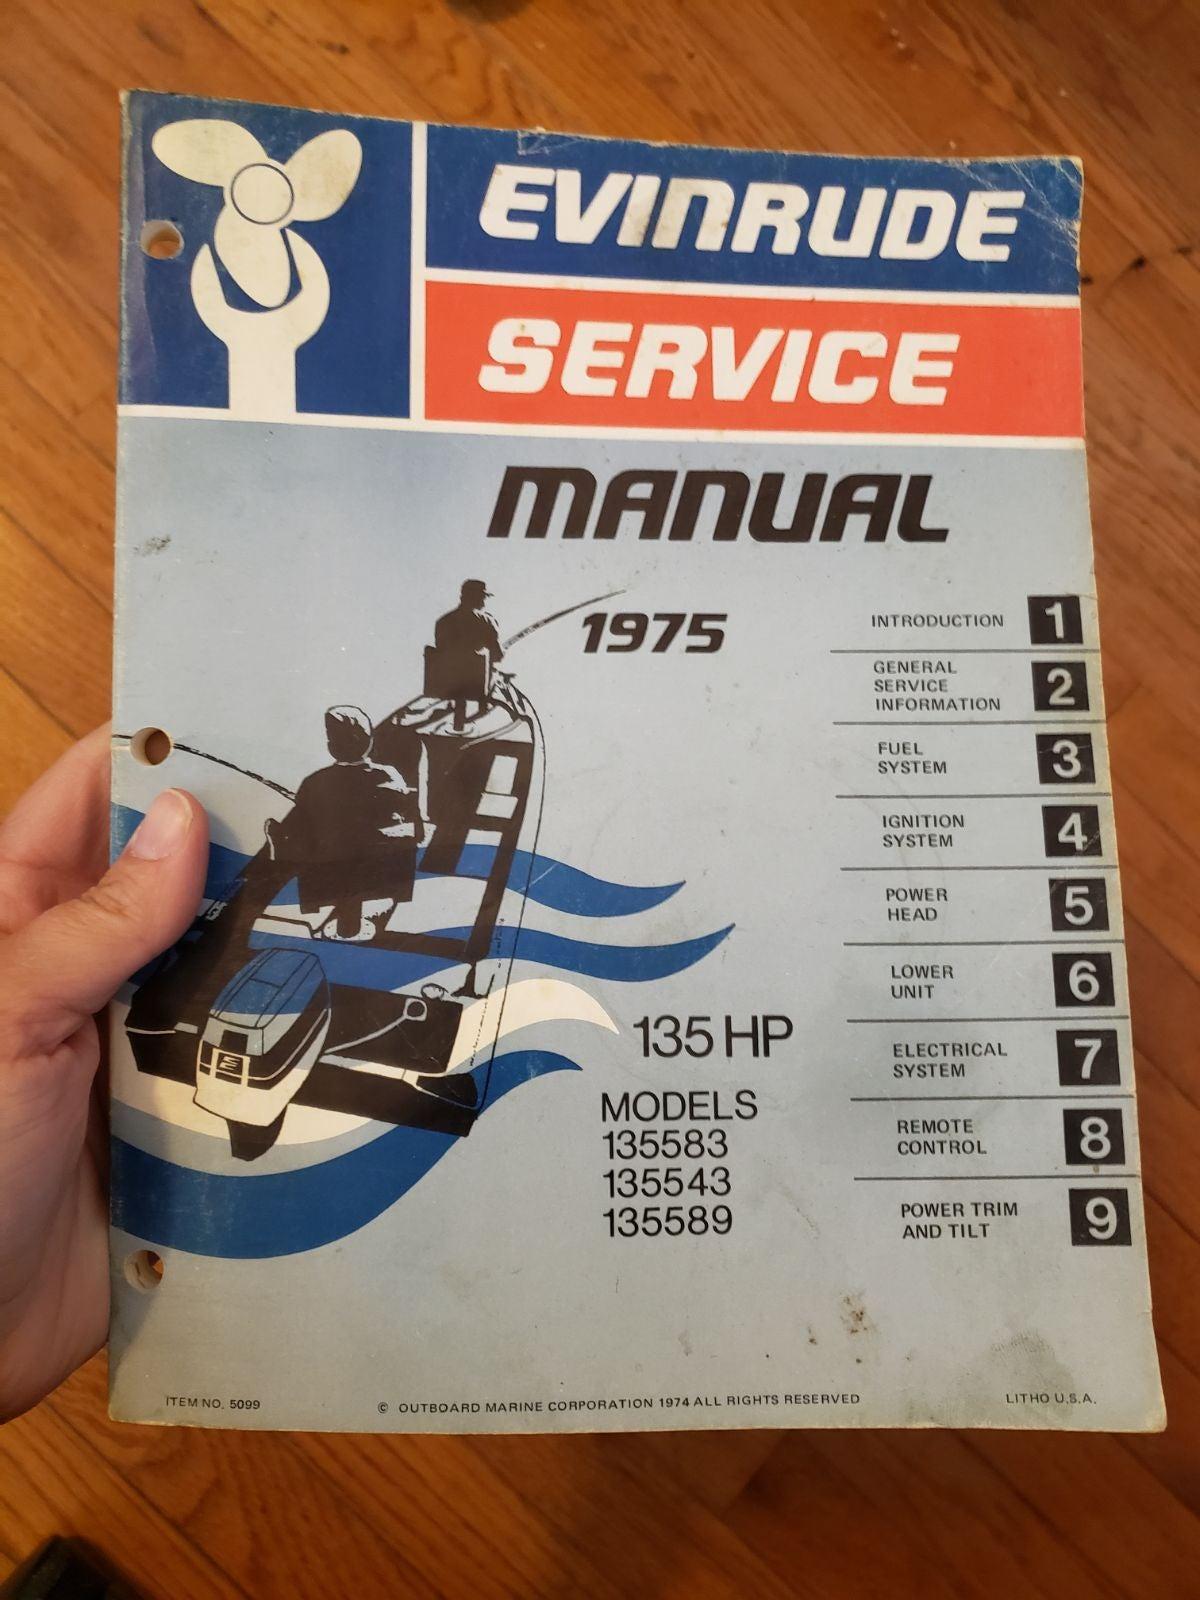 Evinrude Service Manual 1975